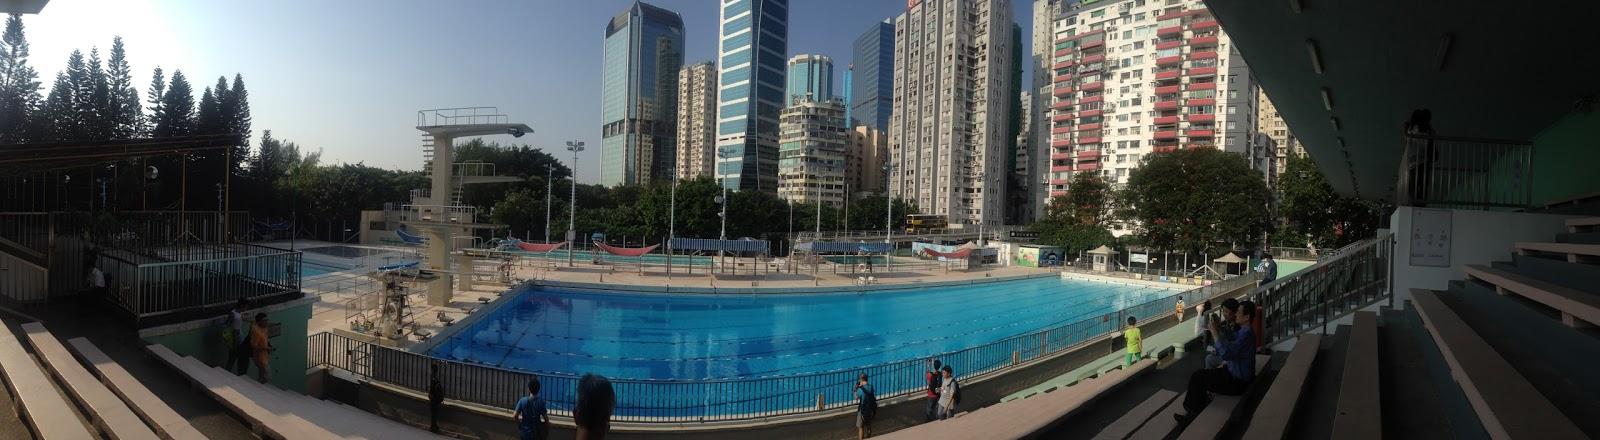 Iceblog Tribute To Victoria Park Swimming Pool